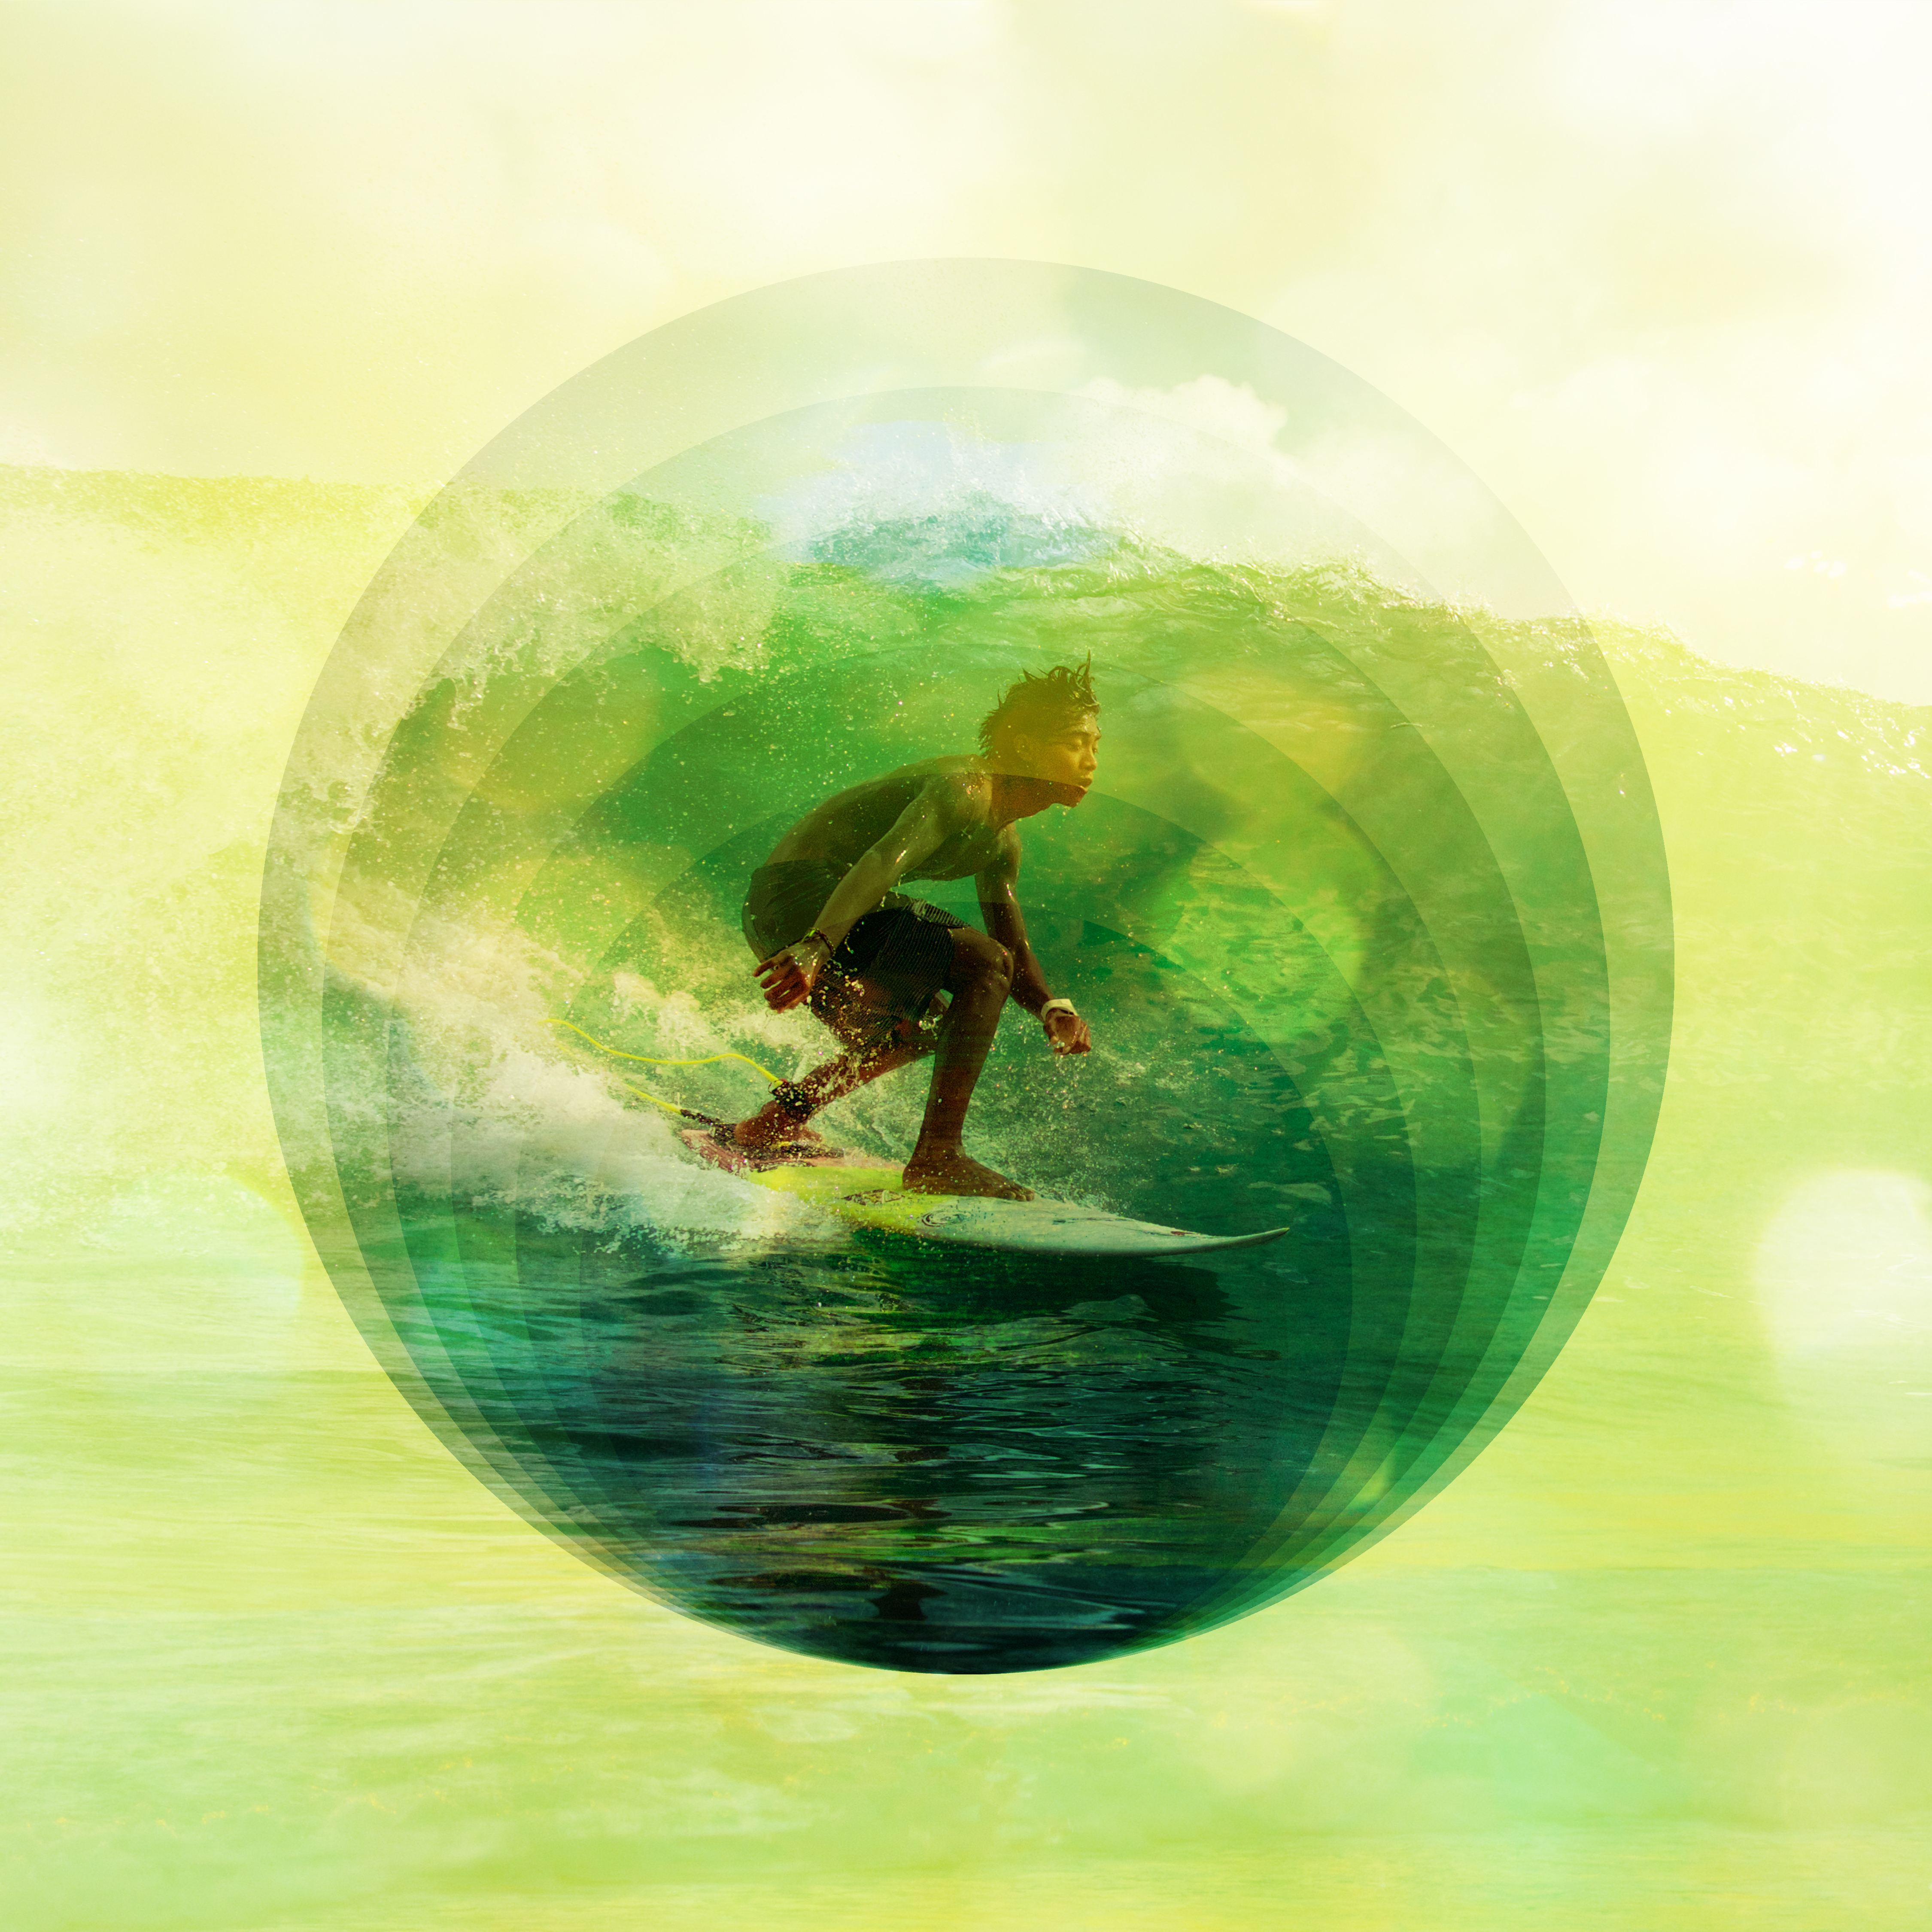 CIRCLE SURFER